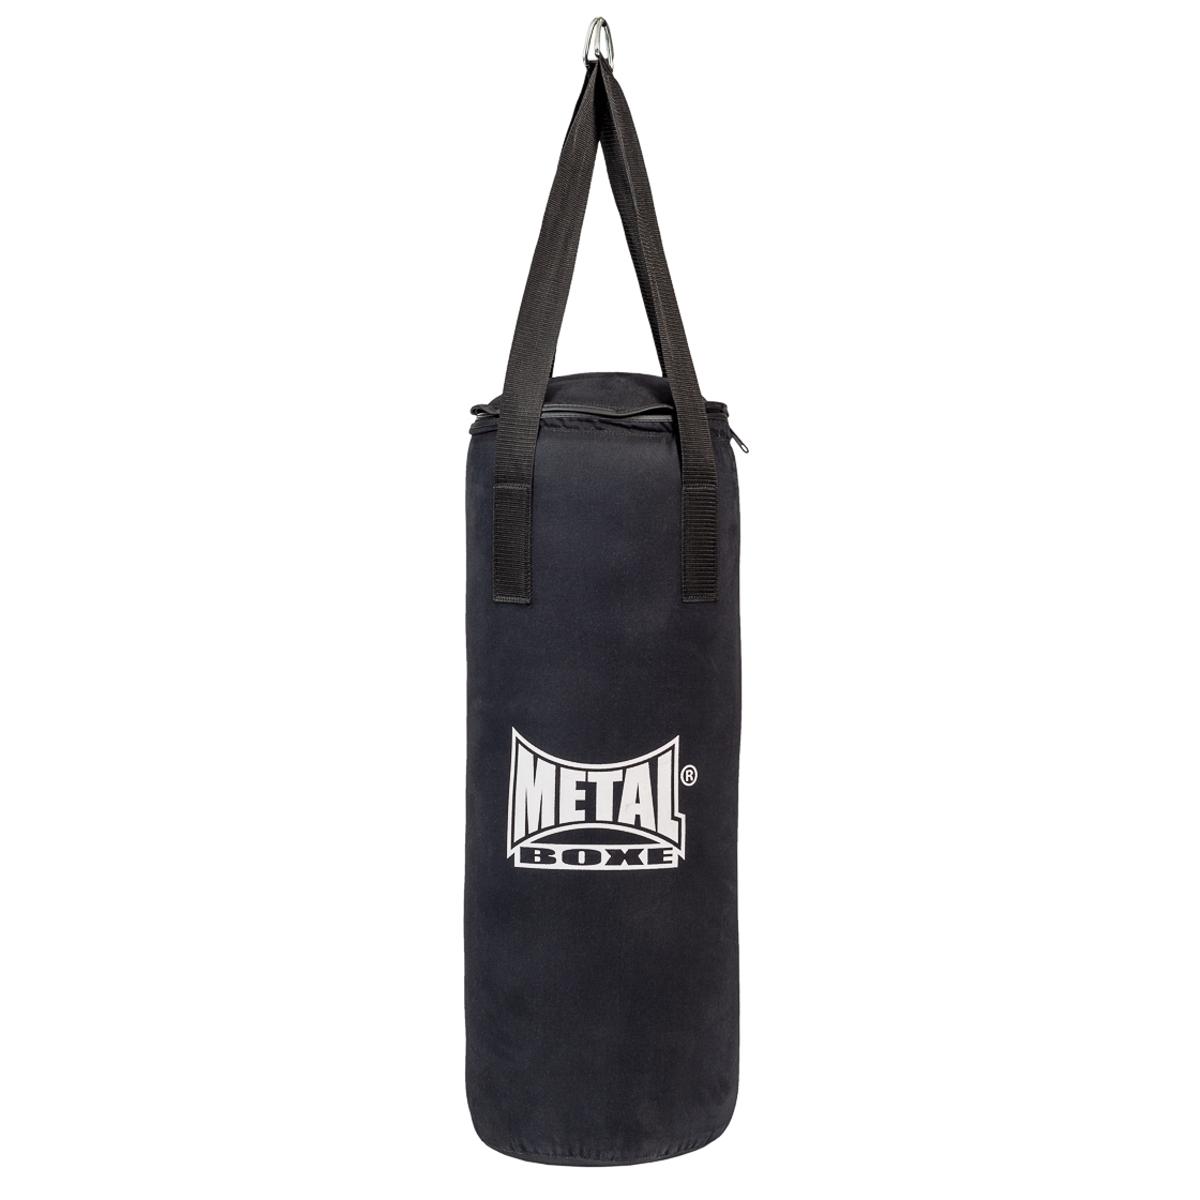 Sac de frappe Métal boxe coton club